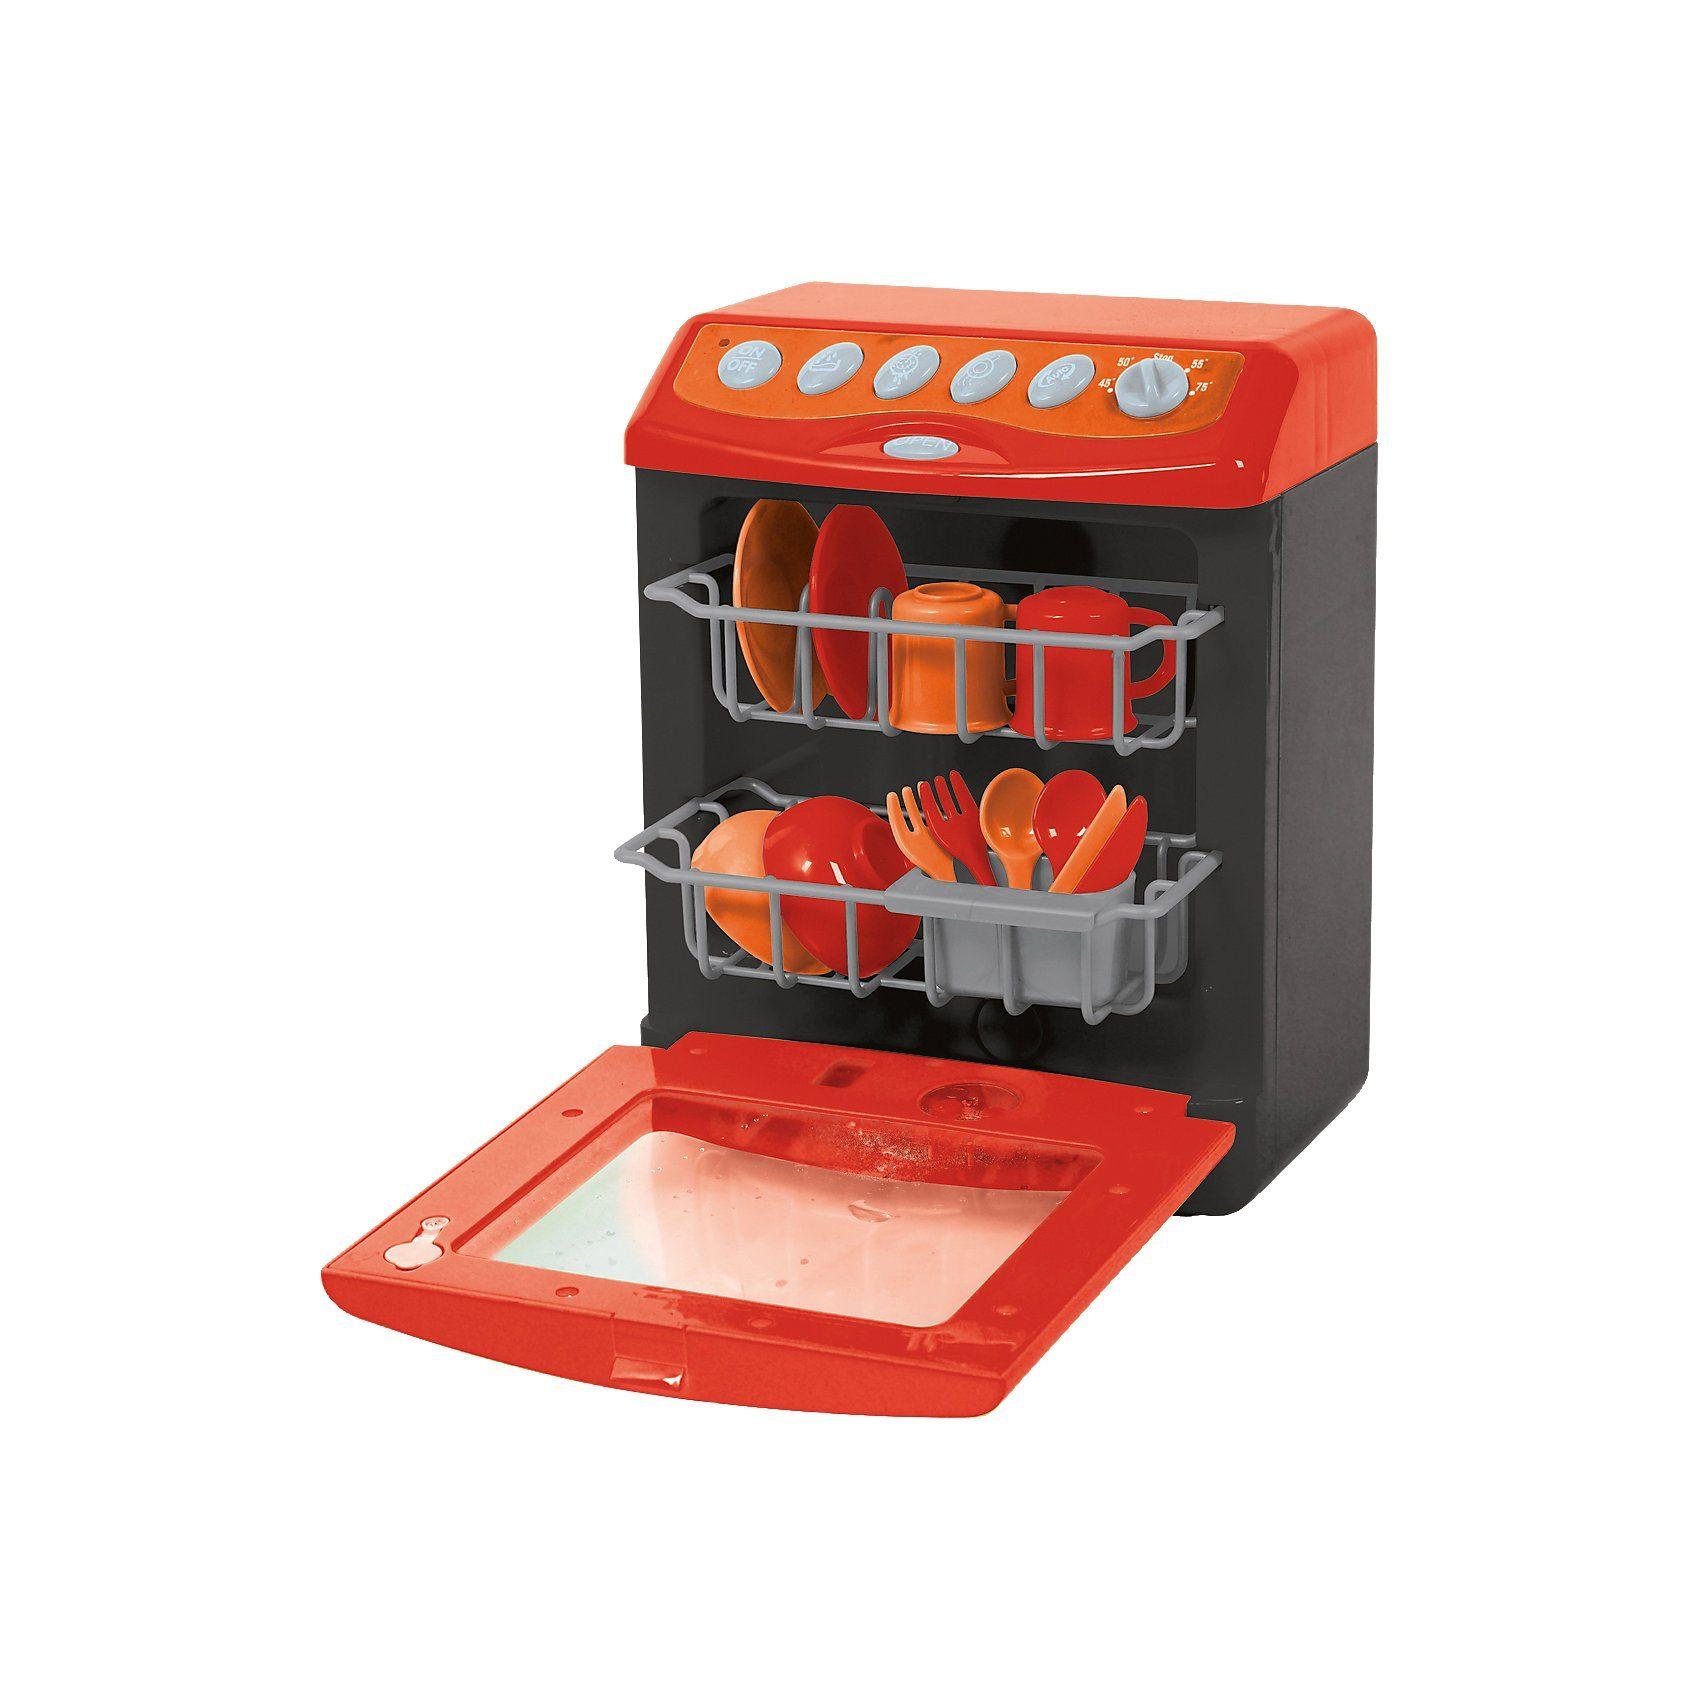 Playgo Geschirrspüler Küchengerät